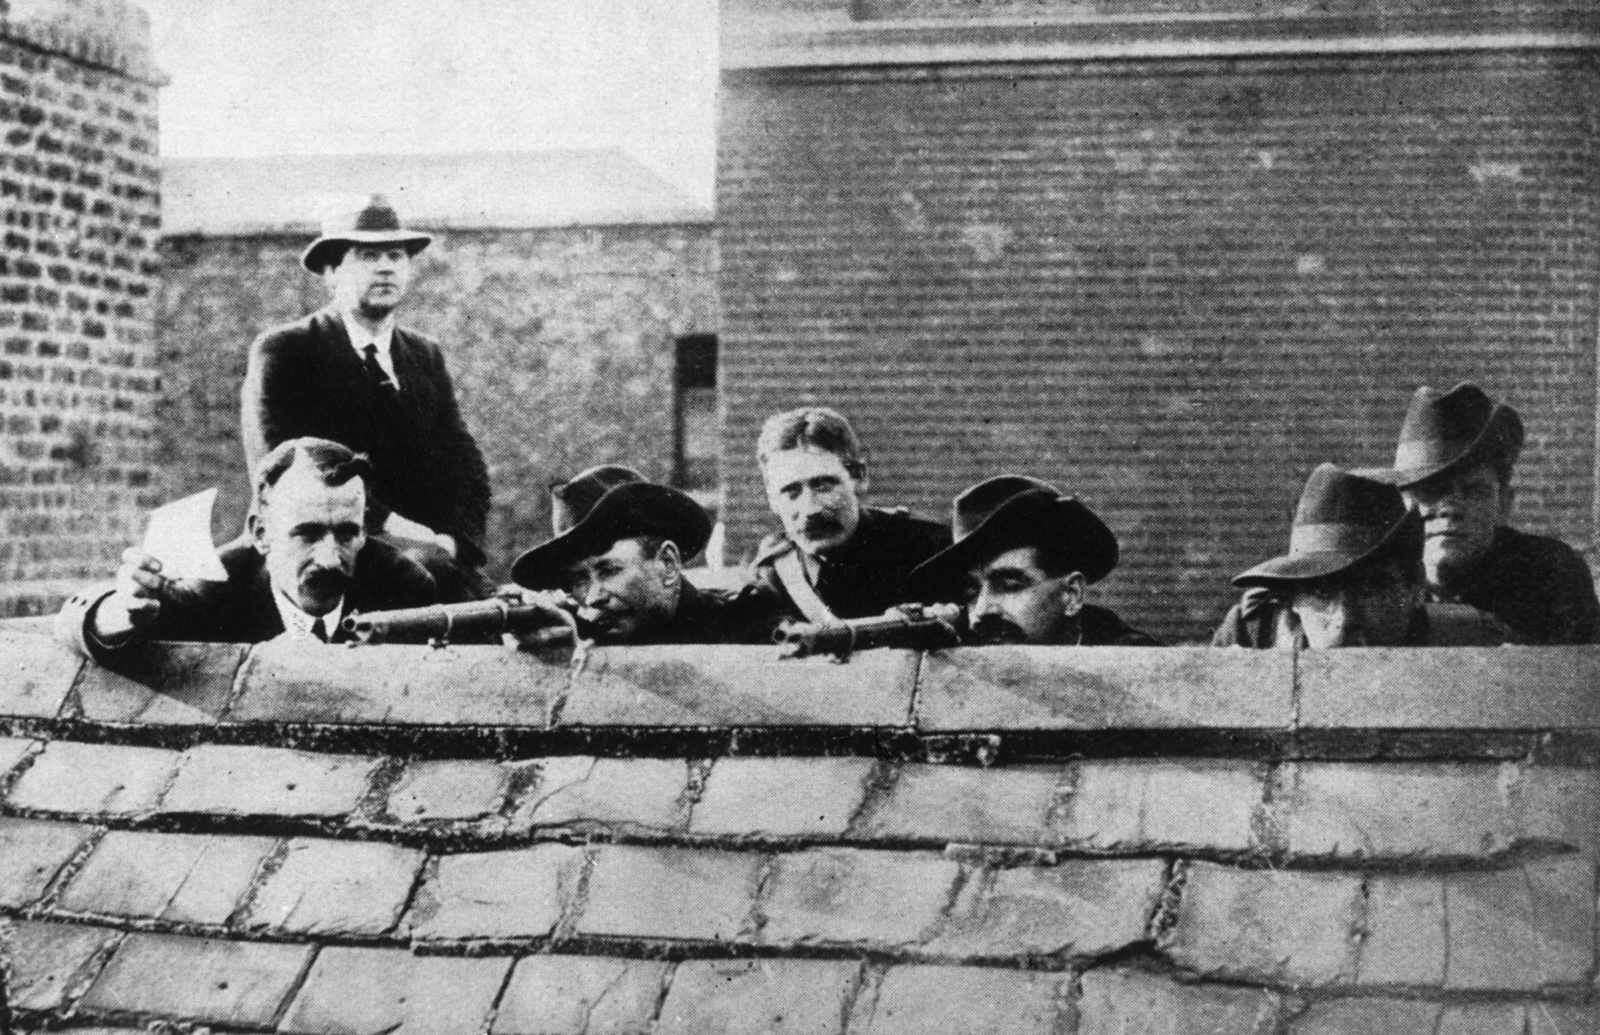 Irish rebels during the Easter Rising, 1916